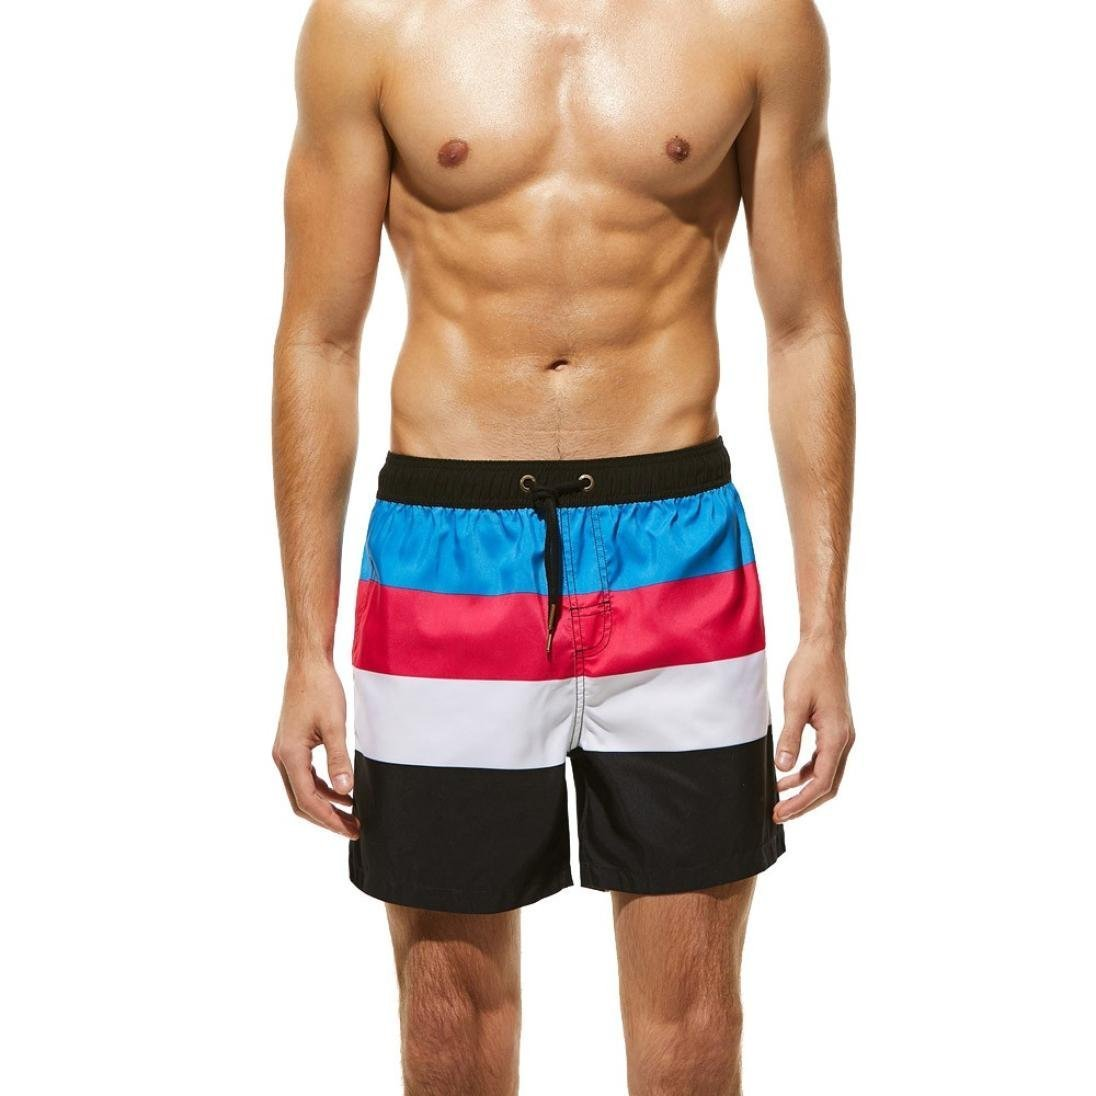 Inverlee Men Trouser Swimwear Running Surfing Sports Beach Shorts Trunks Board Pants (M, Sky Blue)